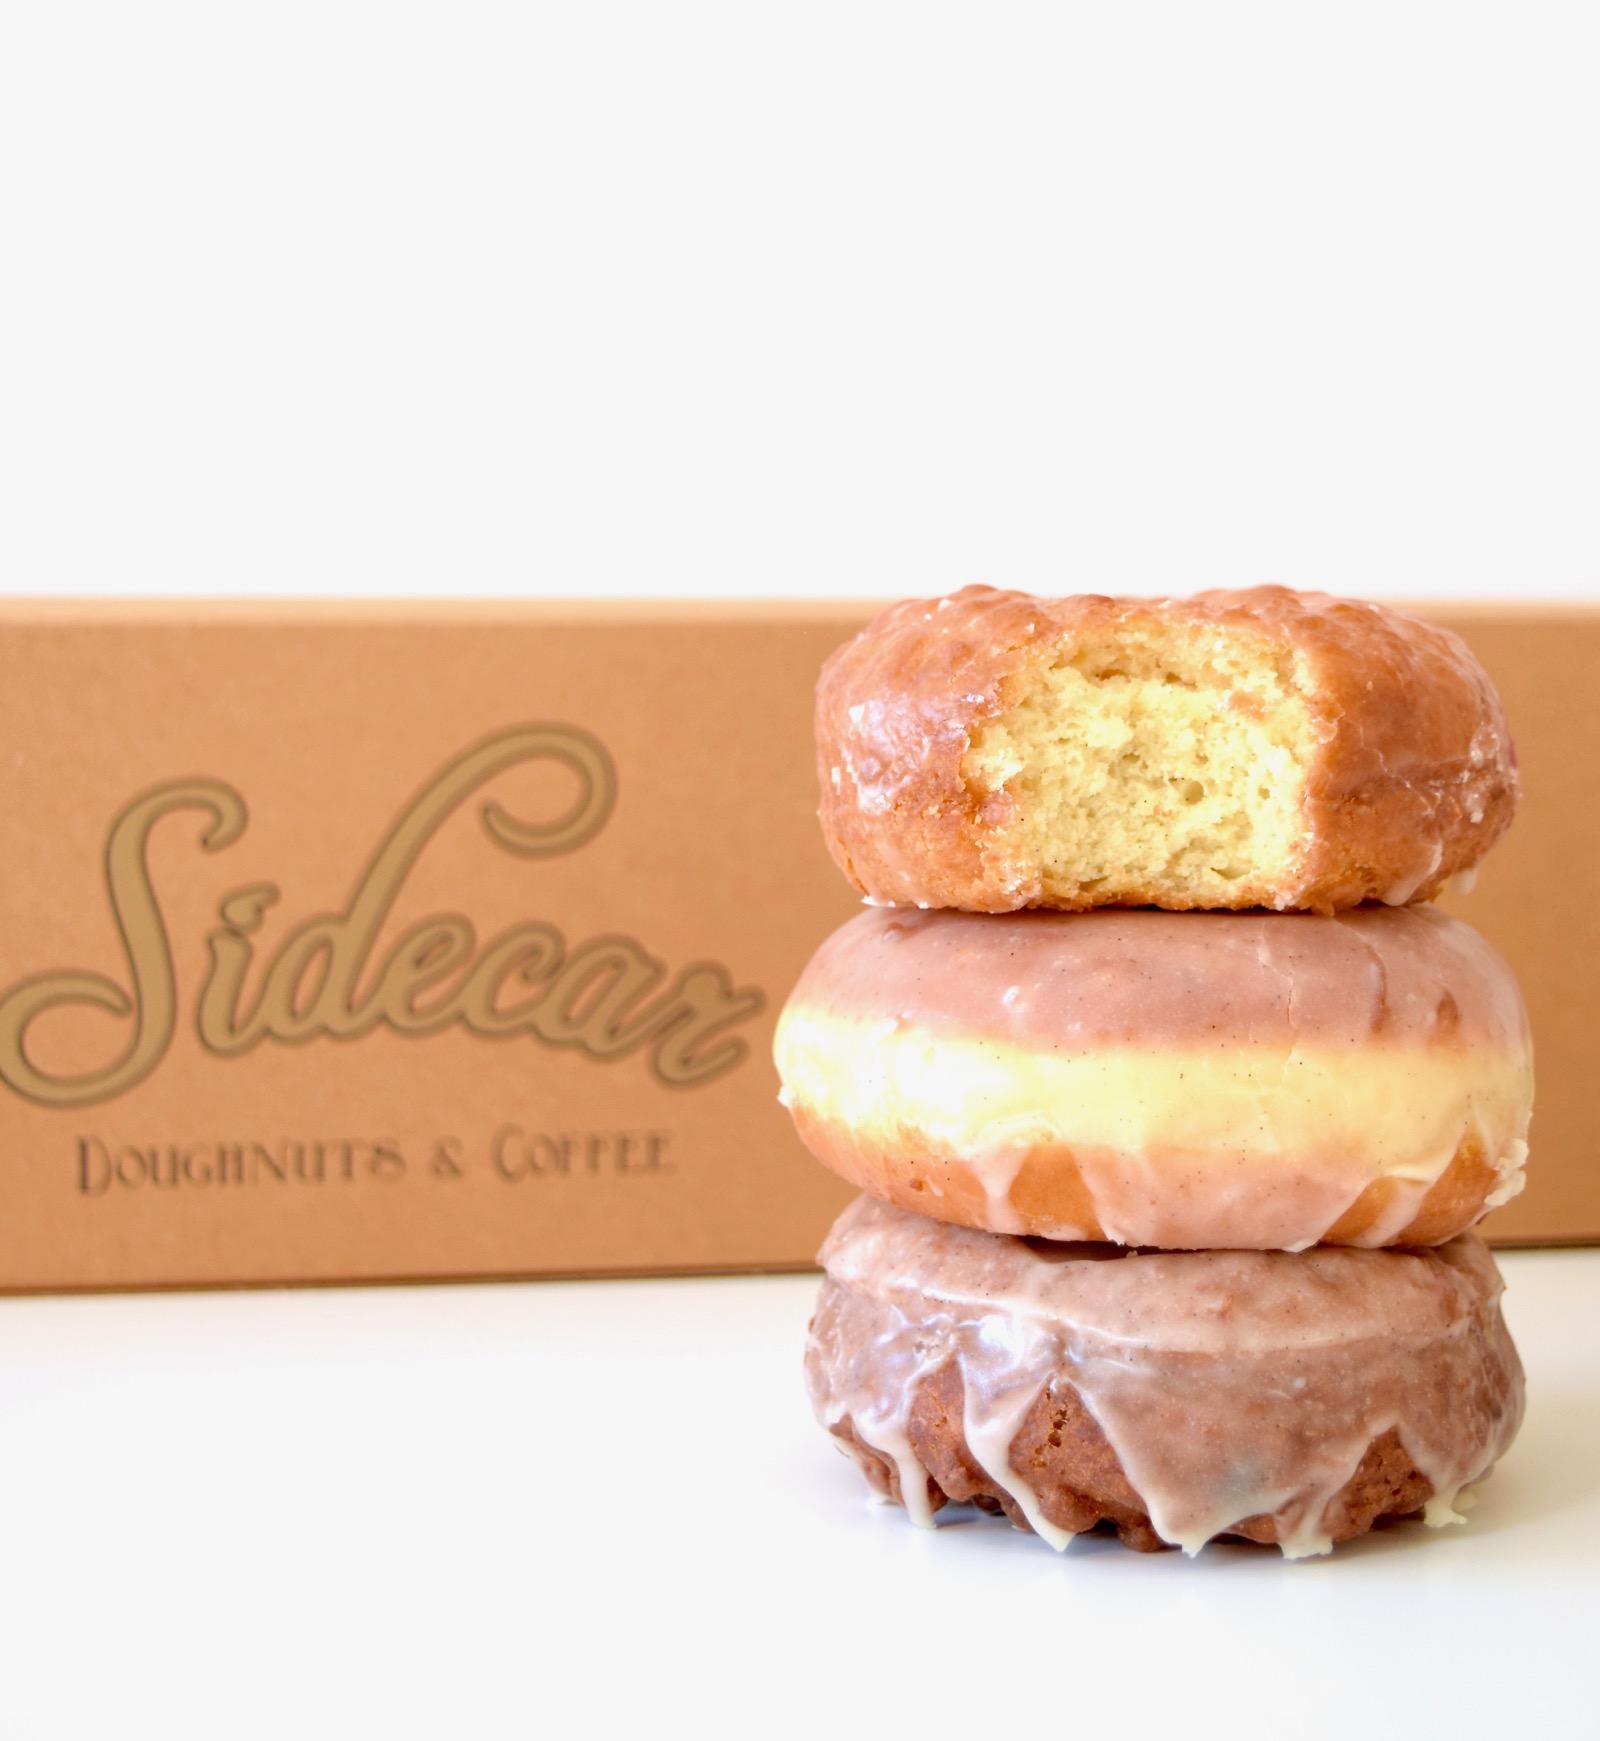 Sidecar Donuts Los Angeles